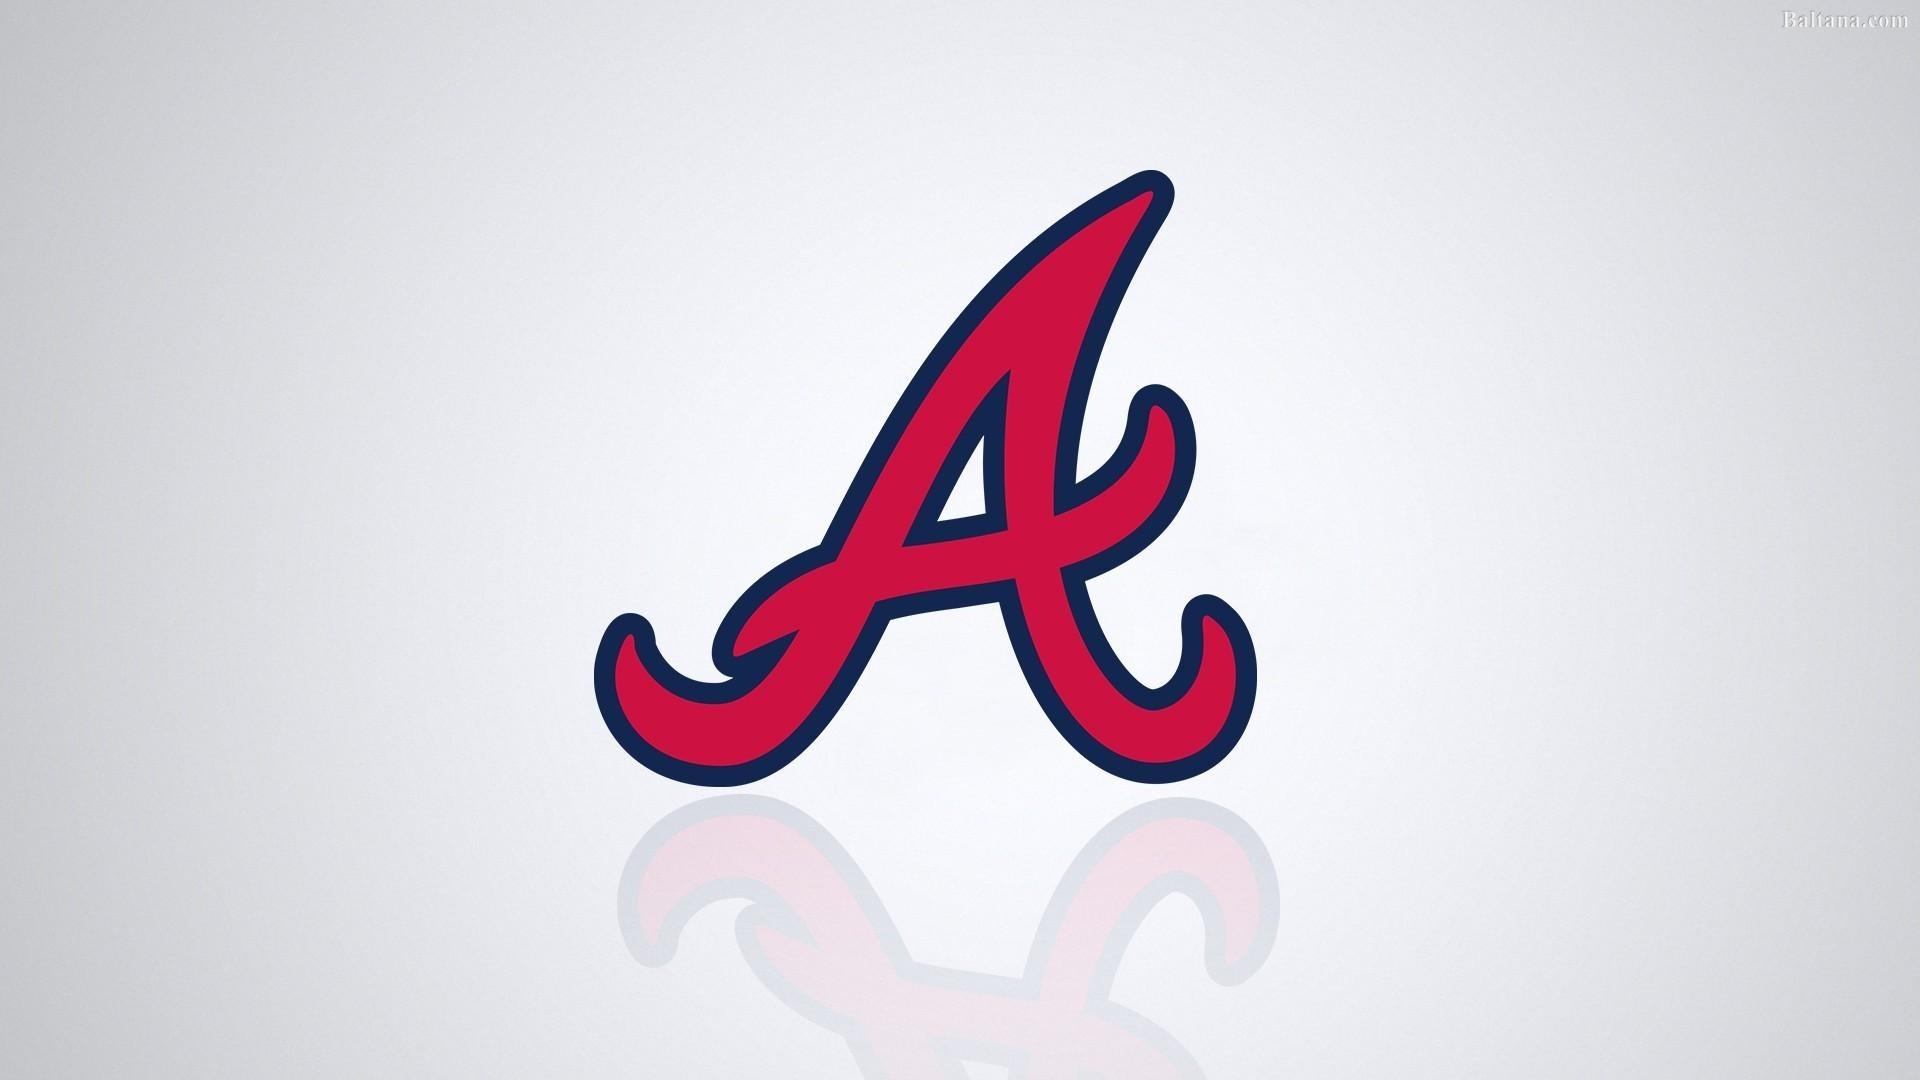 Atlanta Braves hd desktop wallpaper